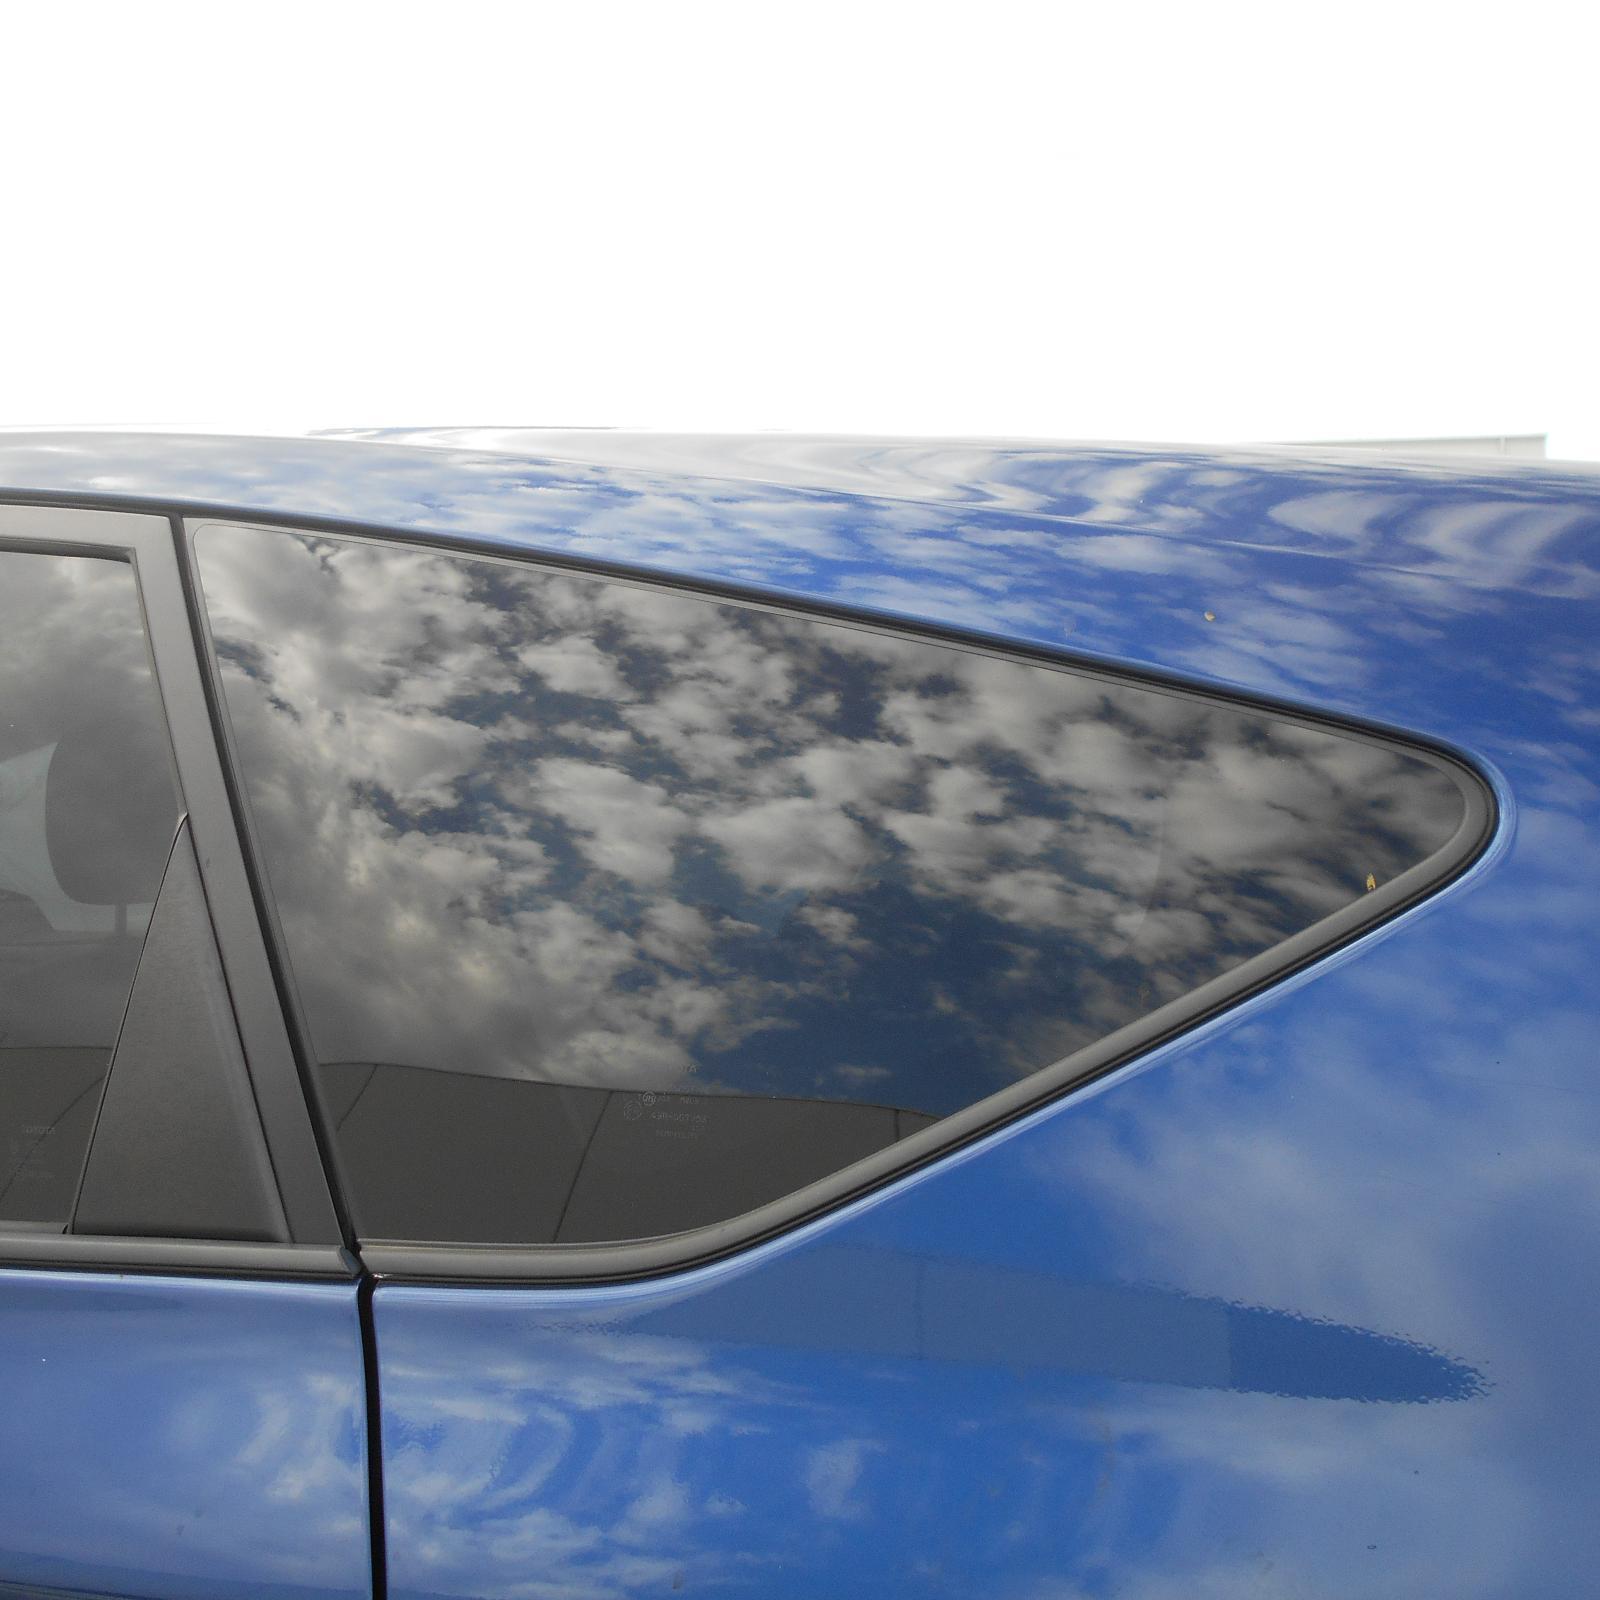 TOYOTA PRIUS, Left Rear Side Glass, ZVW40R, PRIUS V, 05/12-